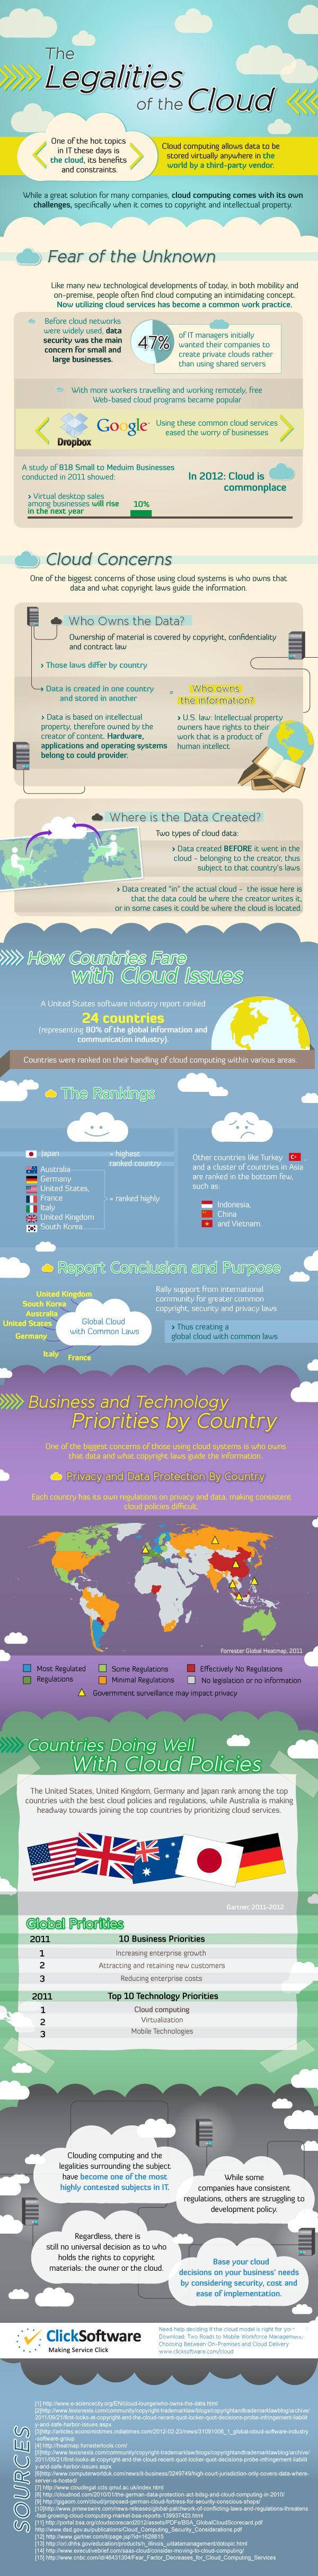 #infographic * THE LEGALITIES OF THE CLOUD * More Tech #infographics » http://pinterest.com/pataplu/infographics-tech/